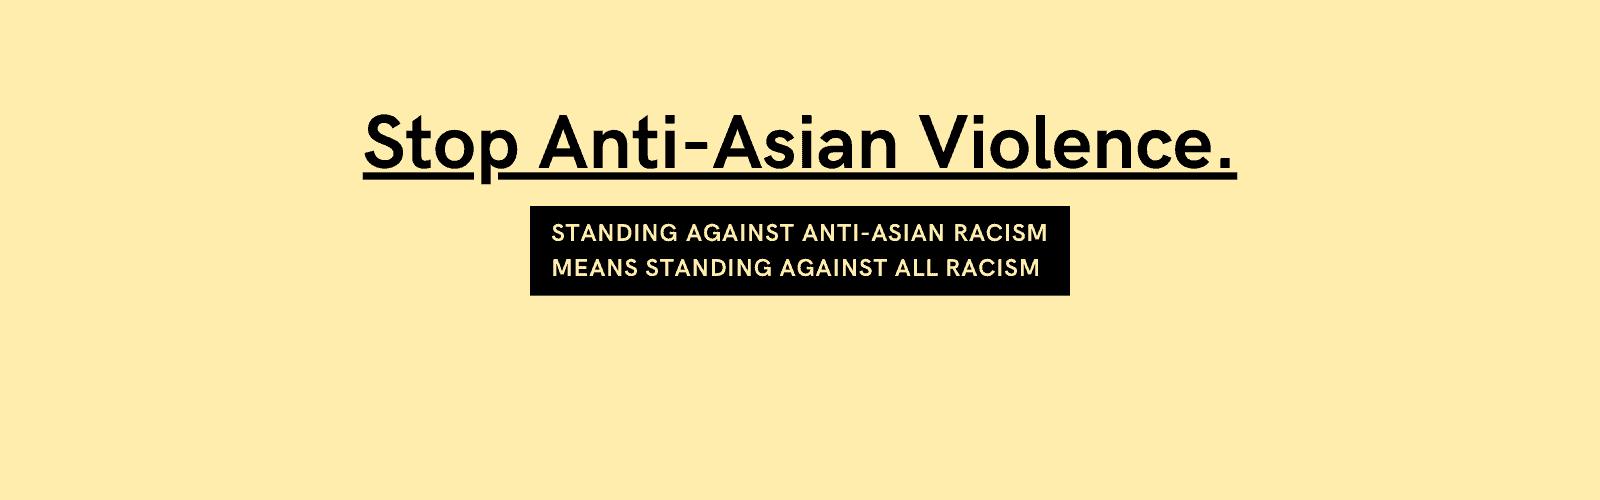 Stop Anti-Asian Violence